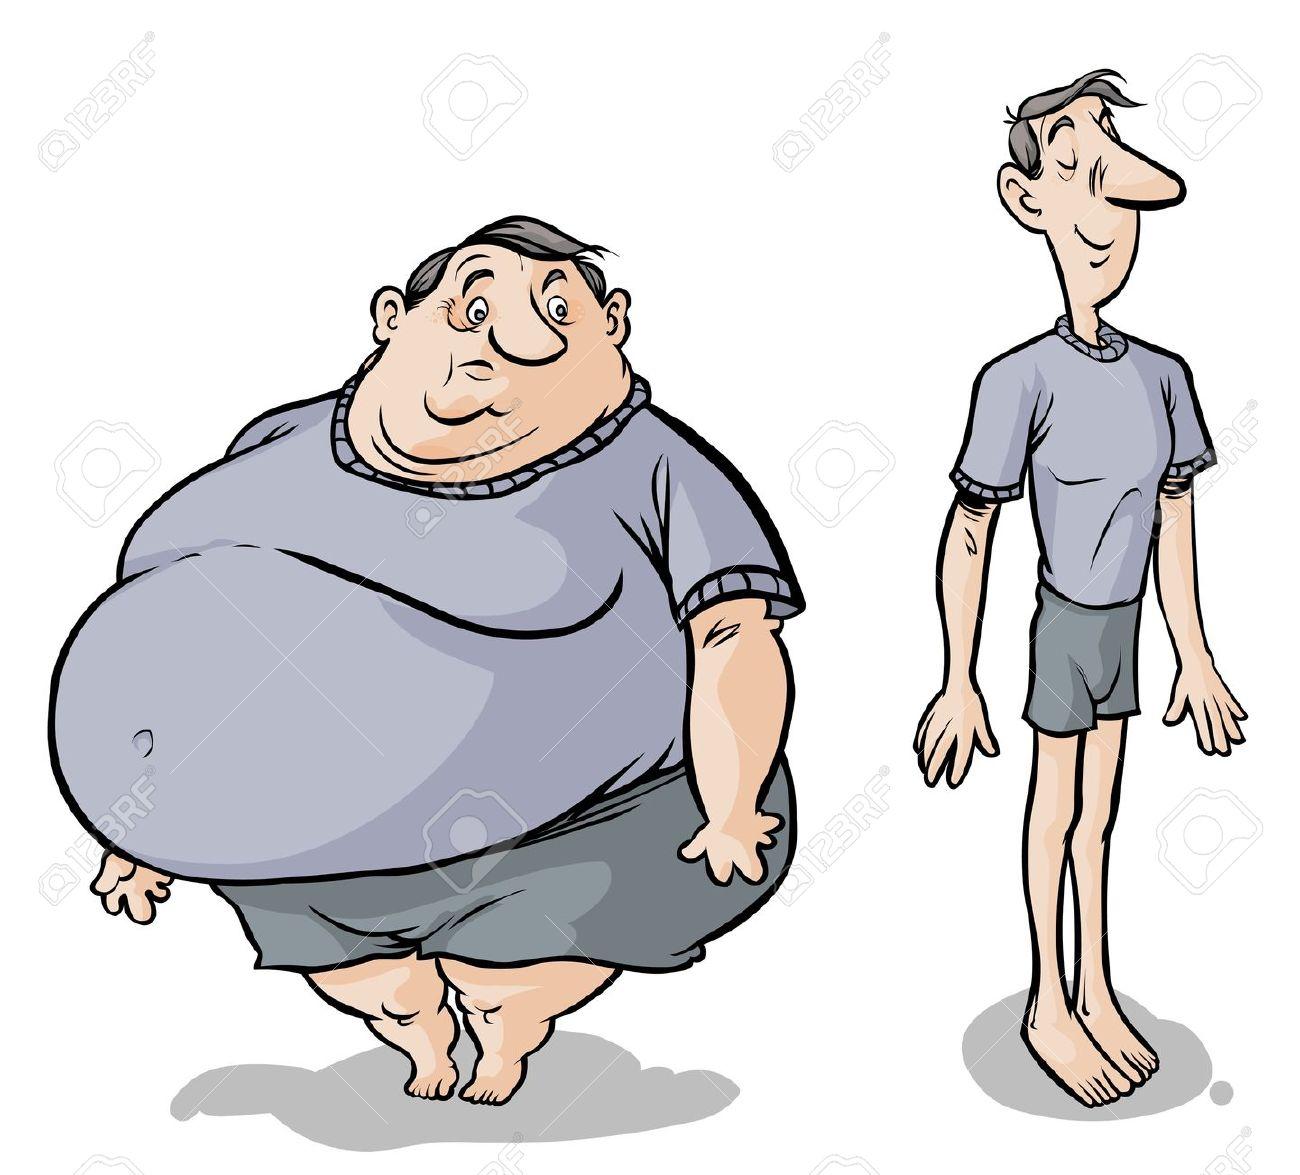 Fat clipart gordo.  clipartlook